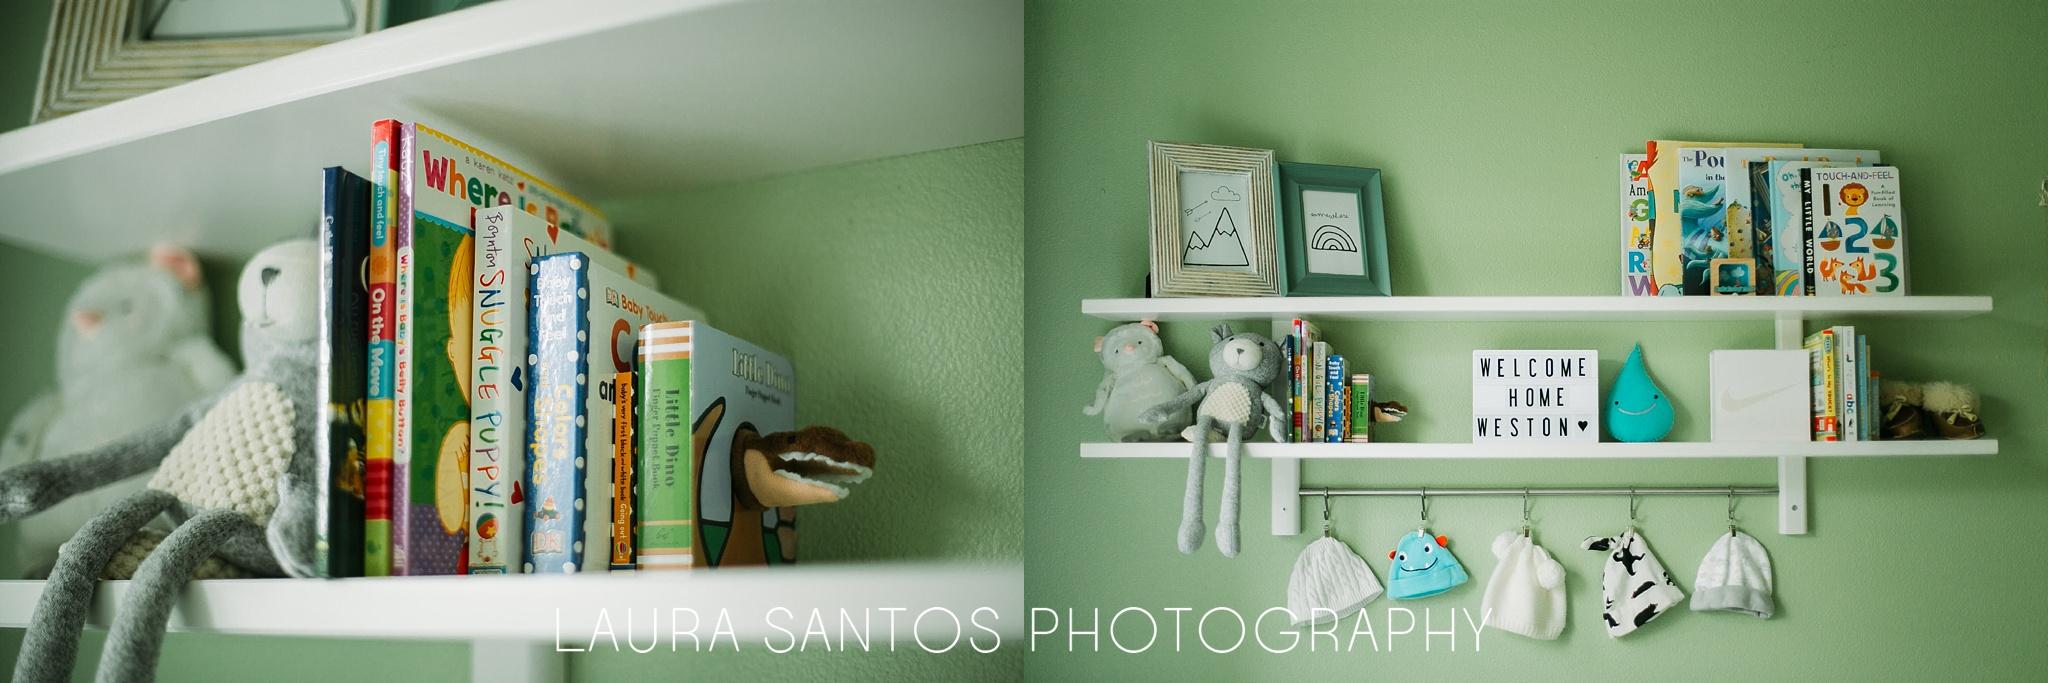 Laura Santos Photography Portland Oregon Family Photographer_0285.jpg